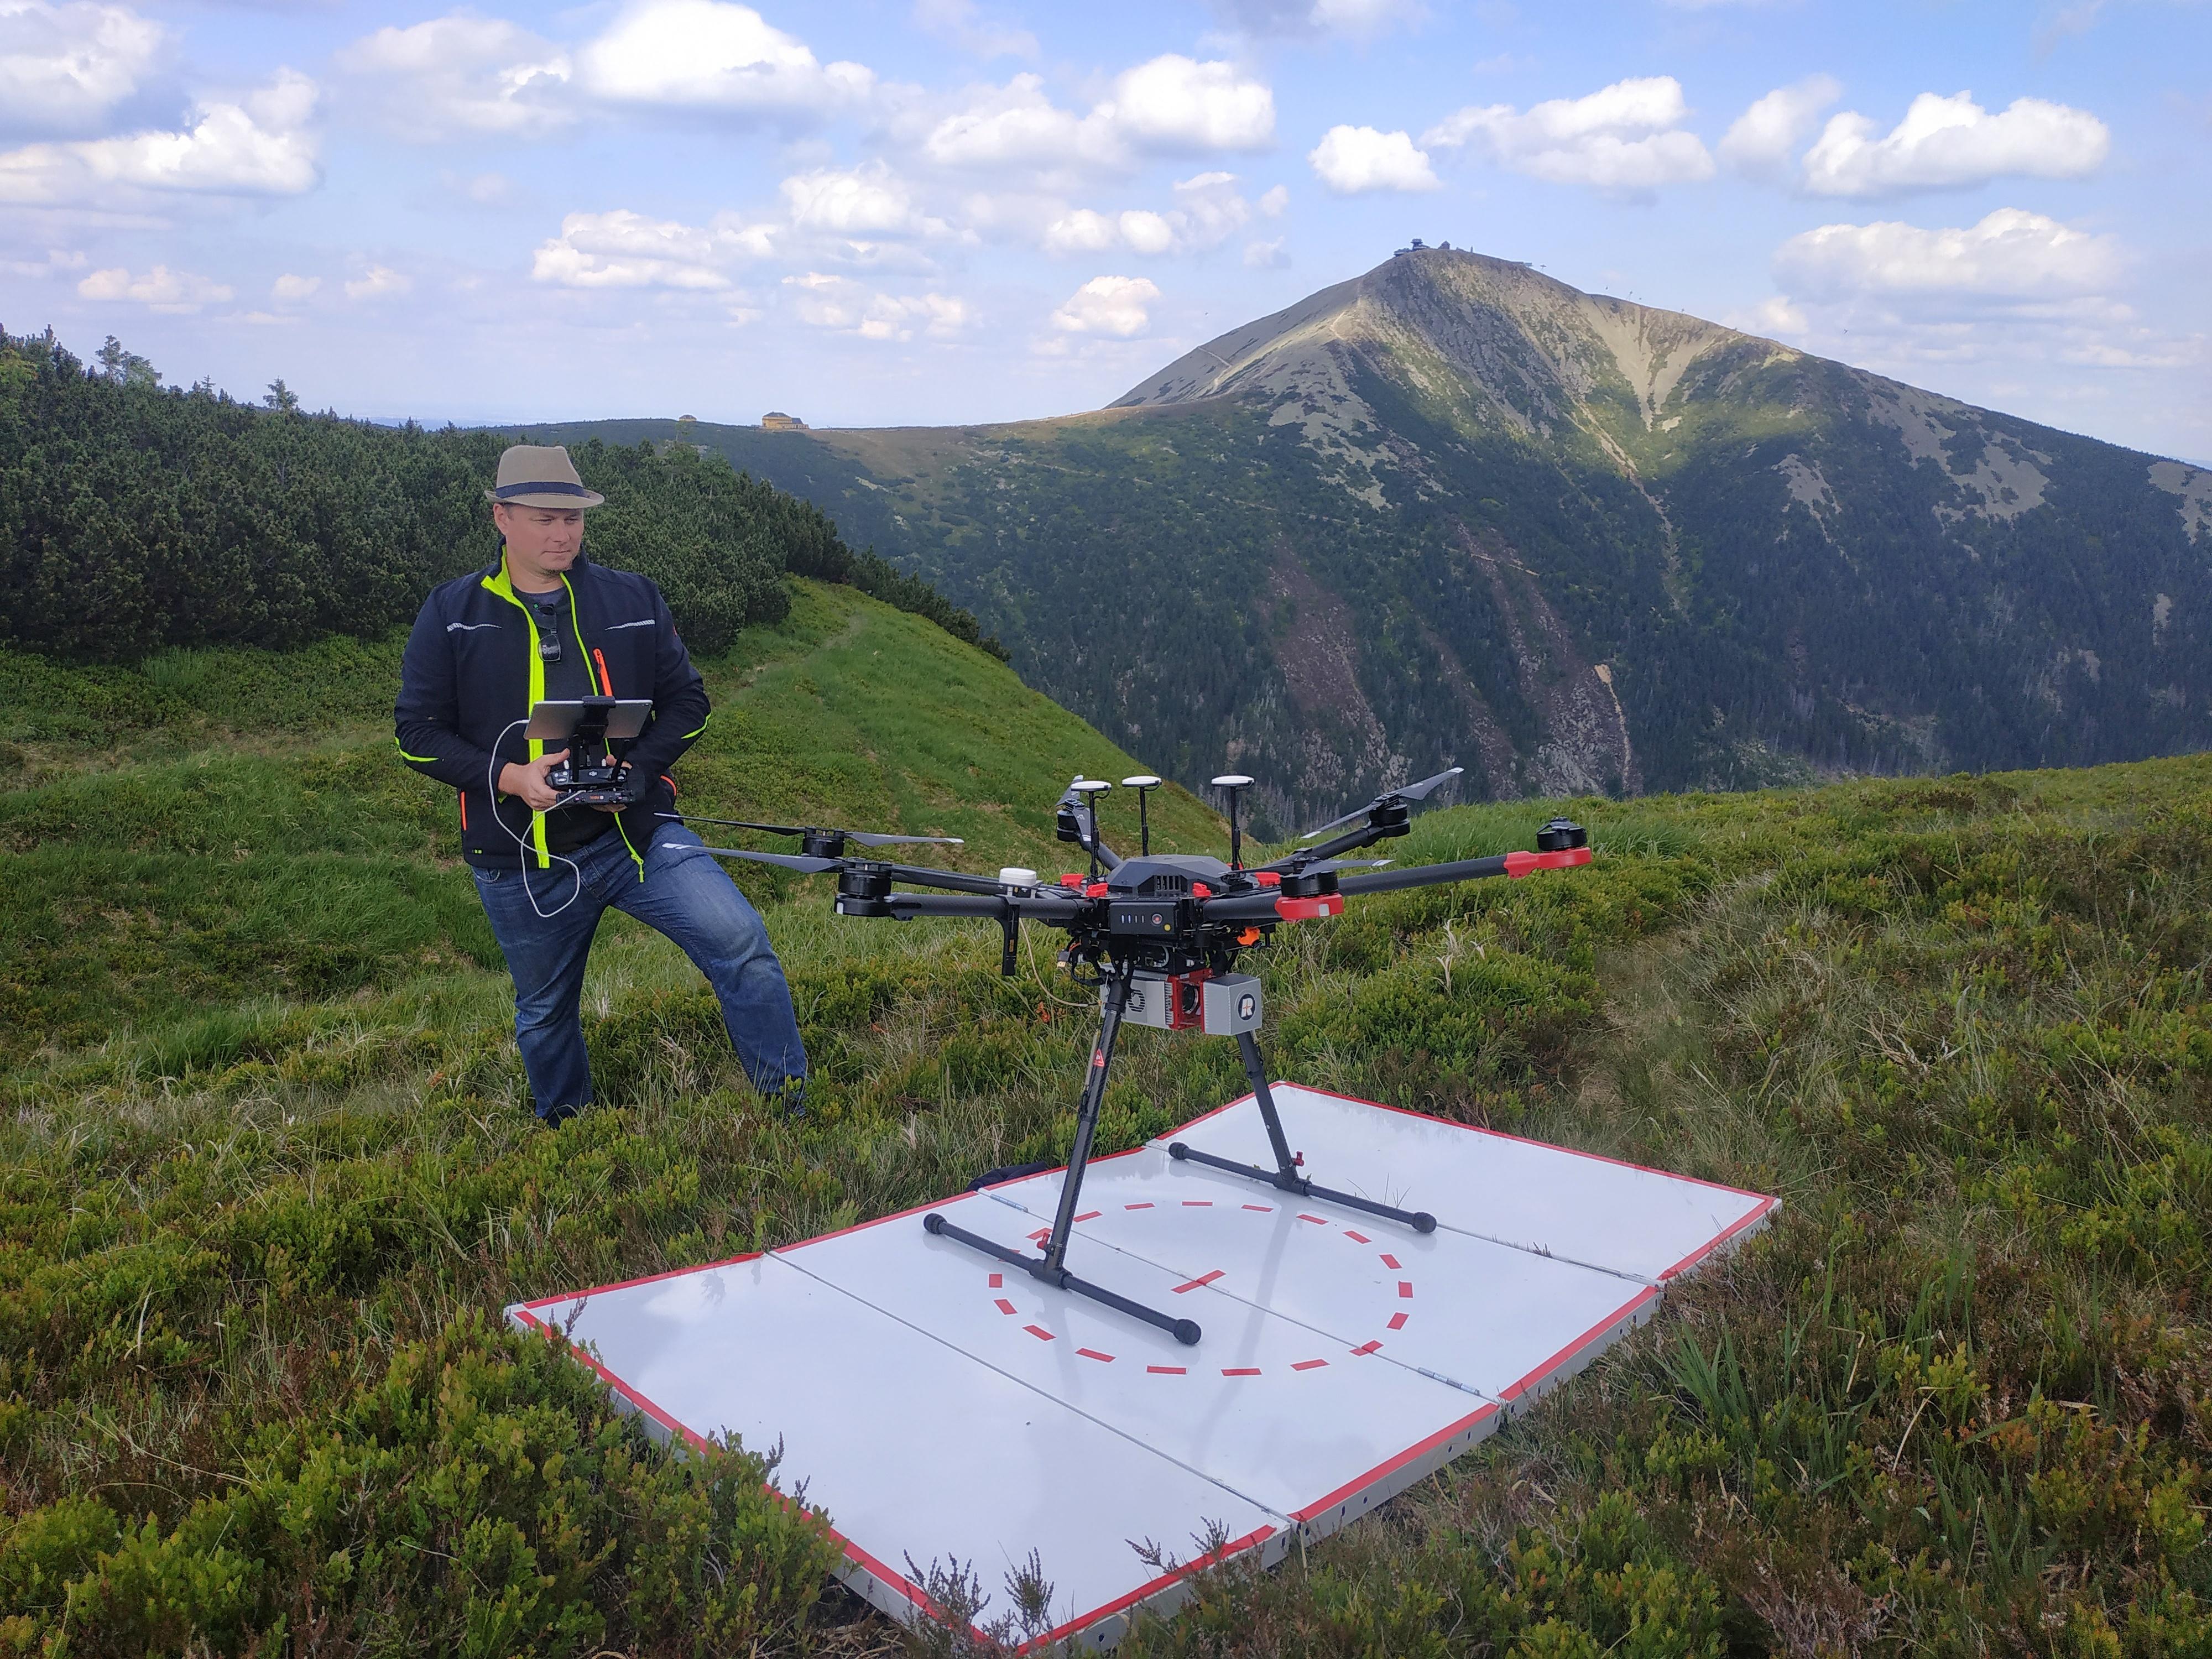 Skenujeme z LiDARu na dronu v KRNAPu pro dlouhodobý projekt s Univerzitou Karlovou